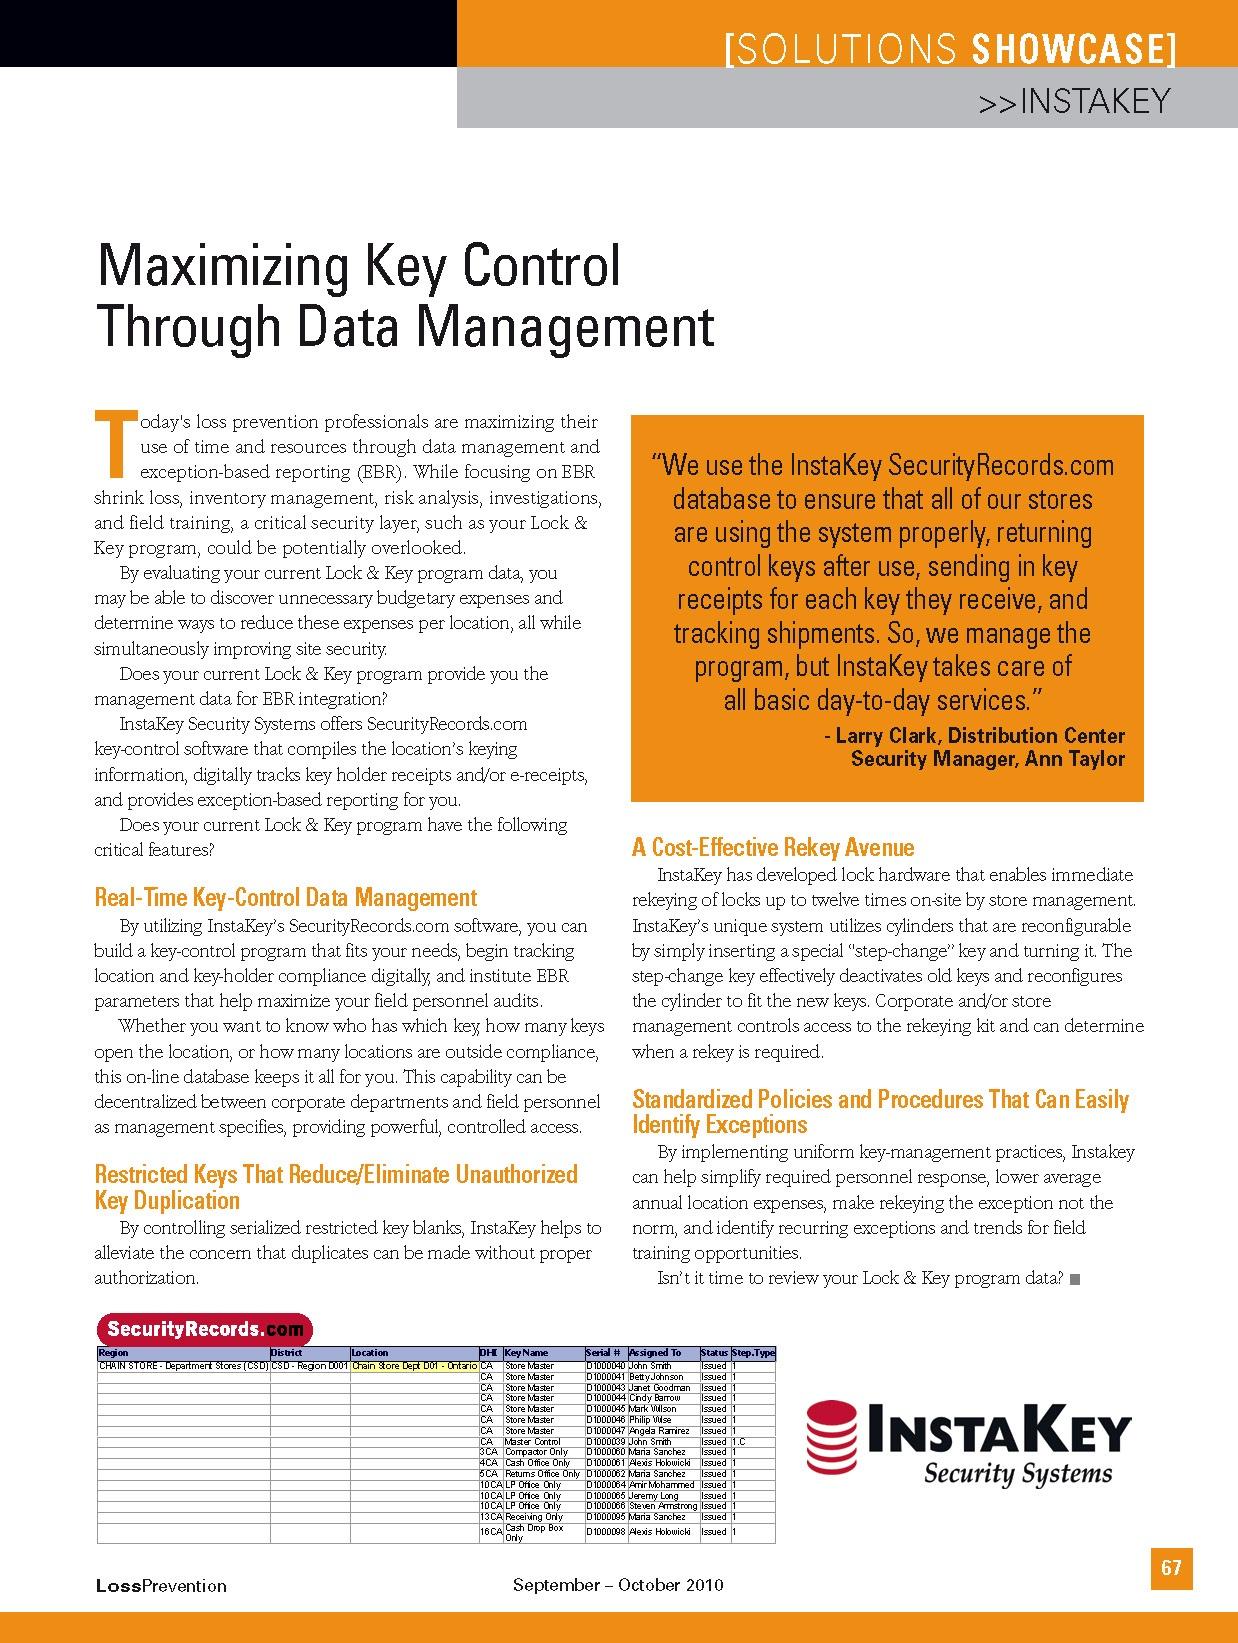 Maximizing Key Control Through Data Management